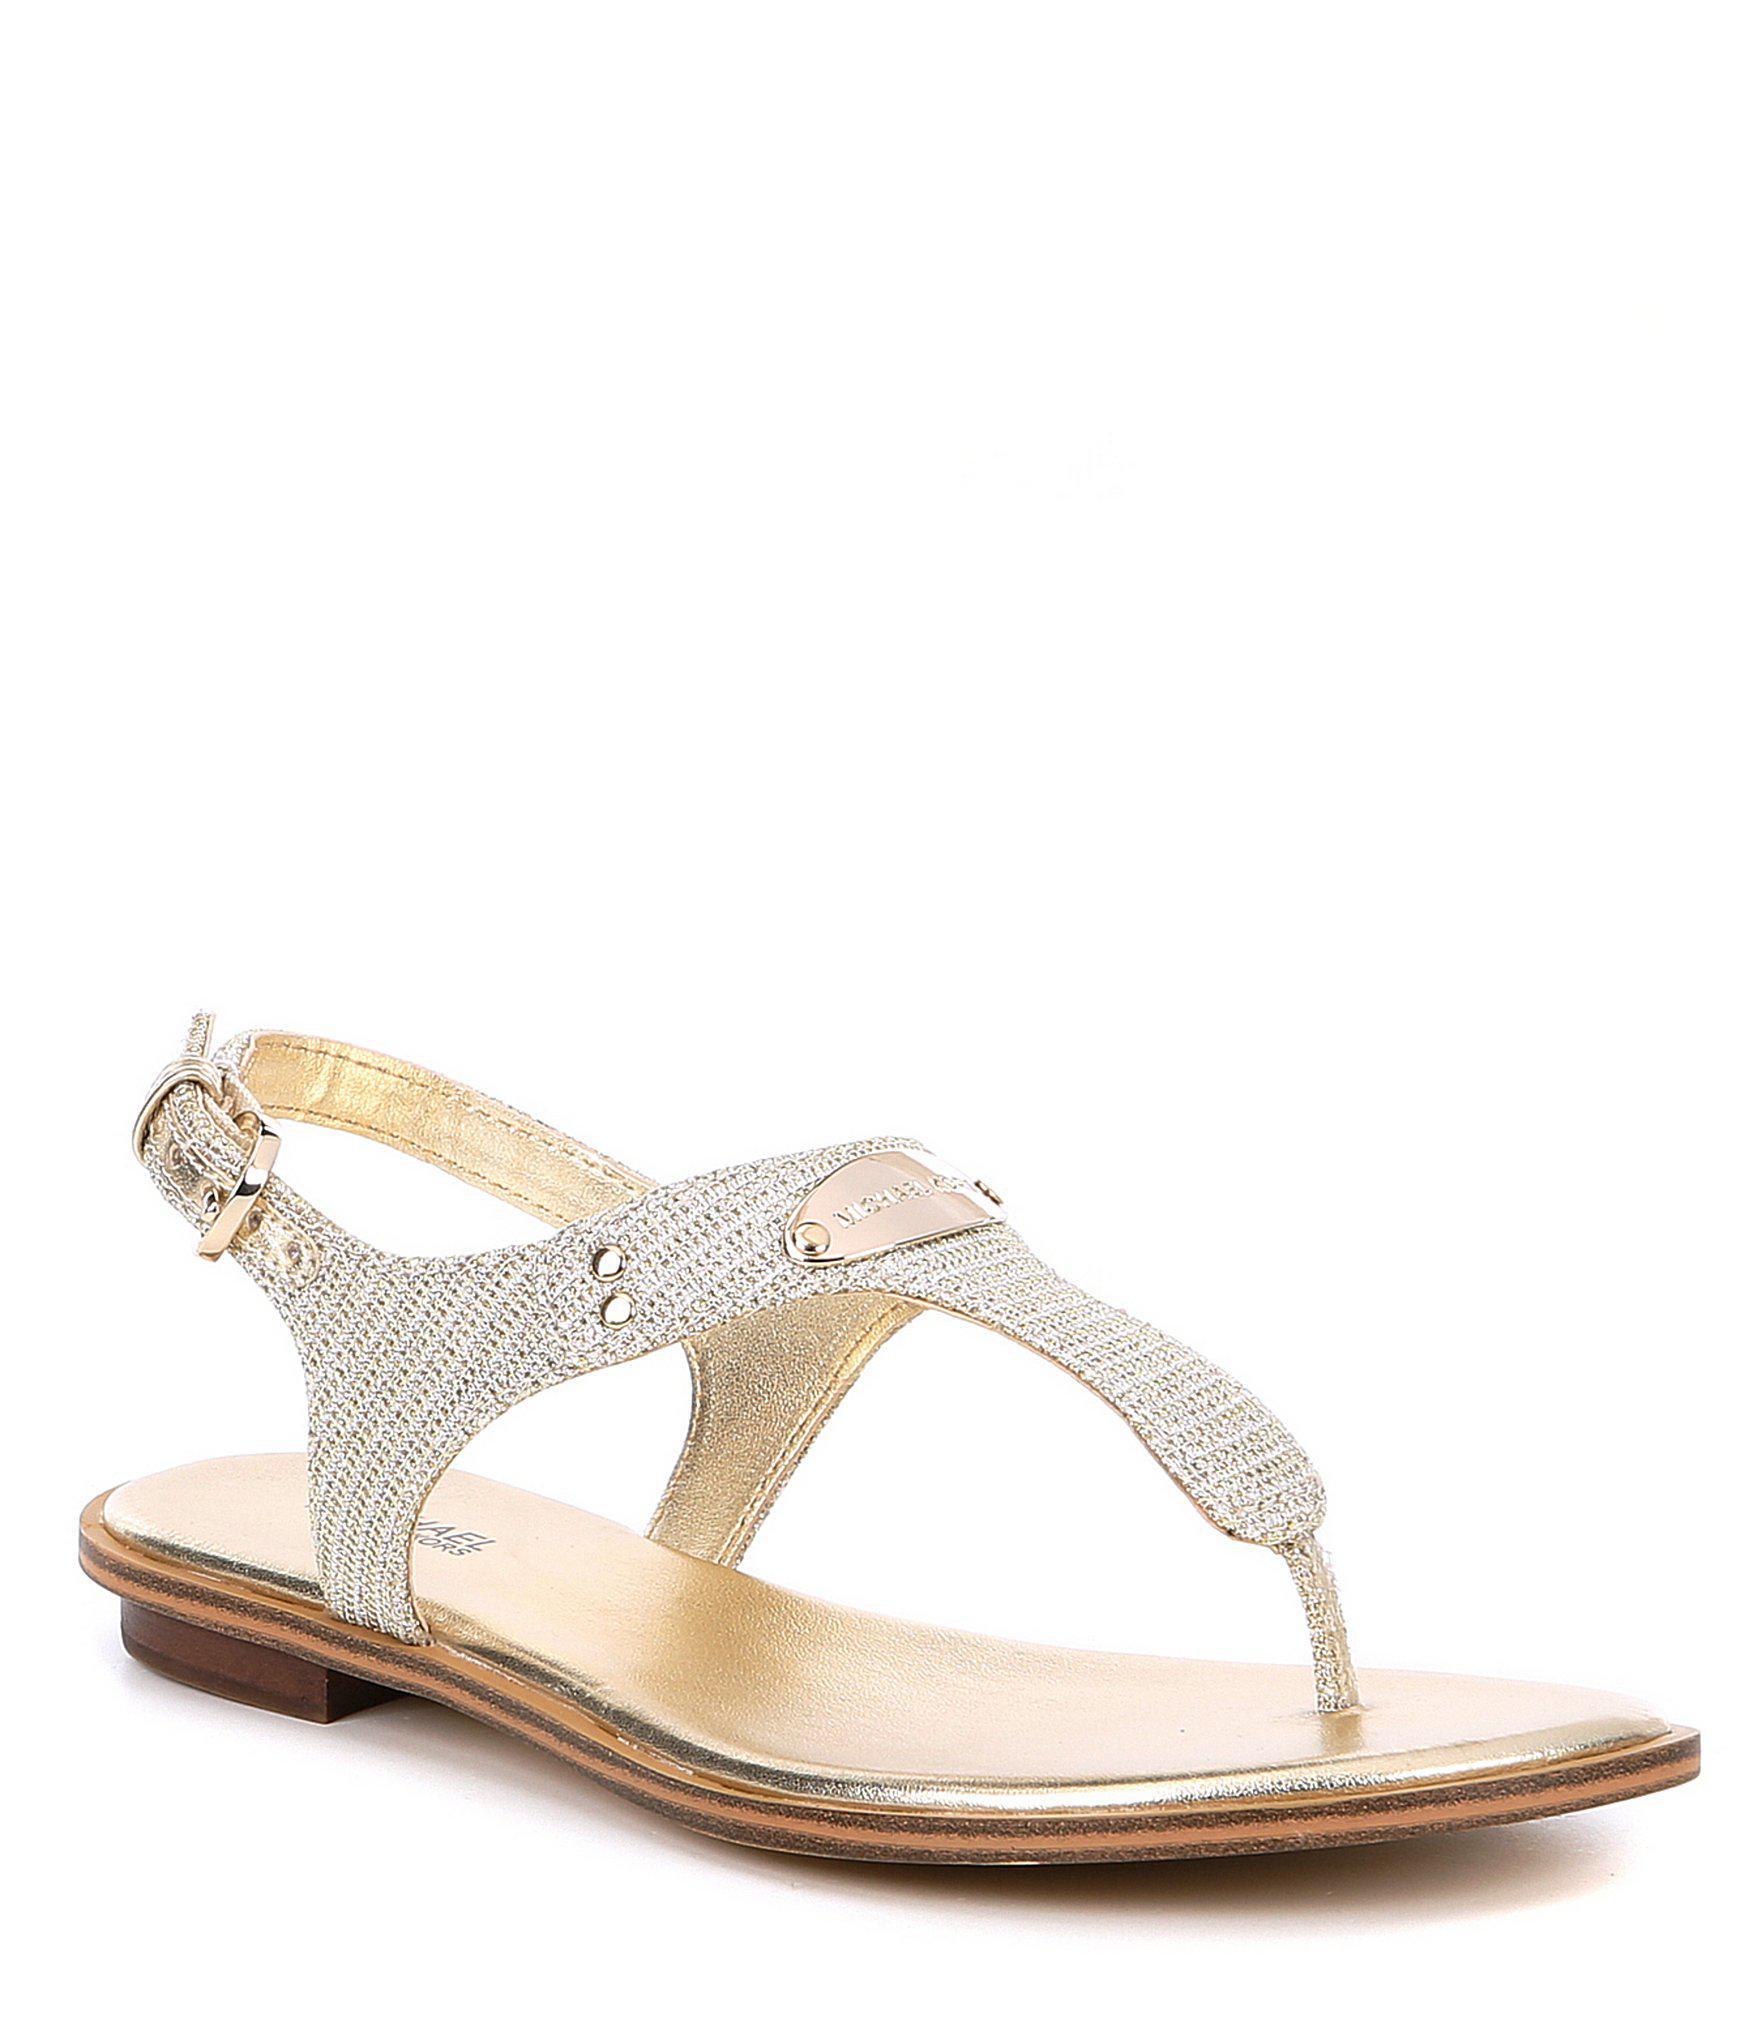 f8c5c8e1aa63ff MICHAEL Michael Kors Mk Plate Glitter Thong Sandals in Metallic - Lyst